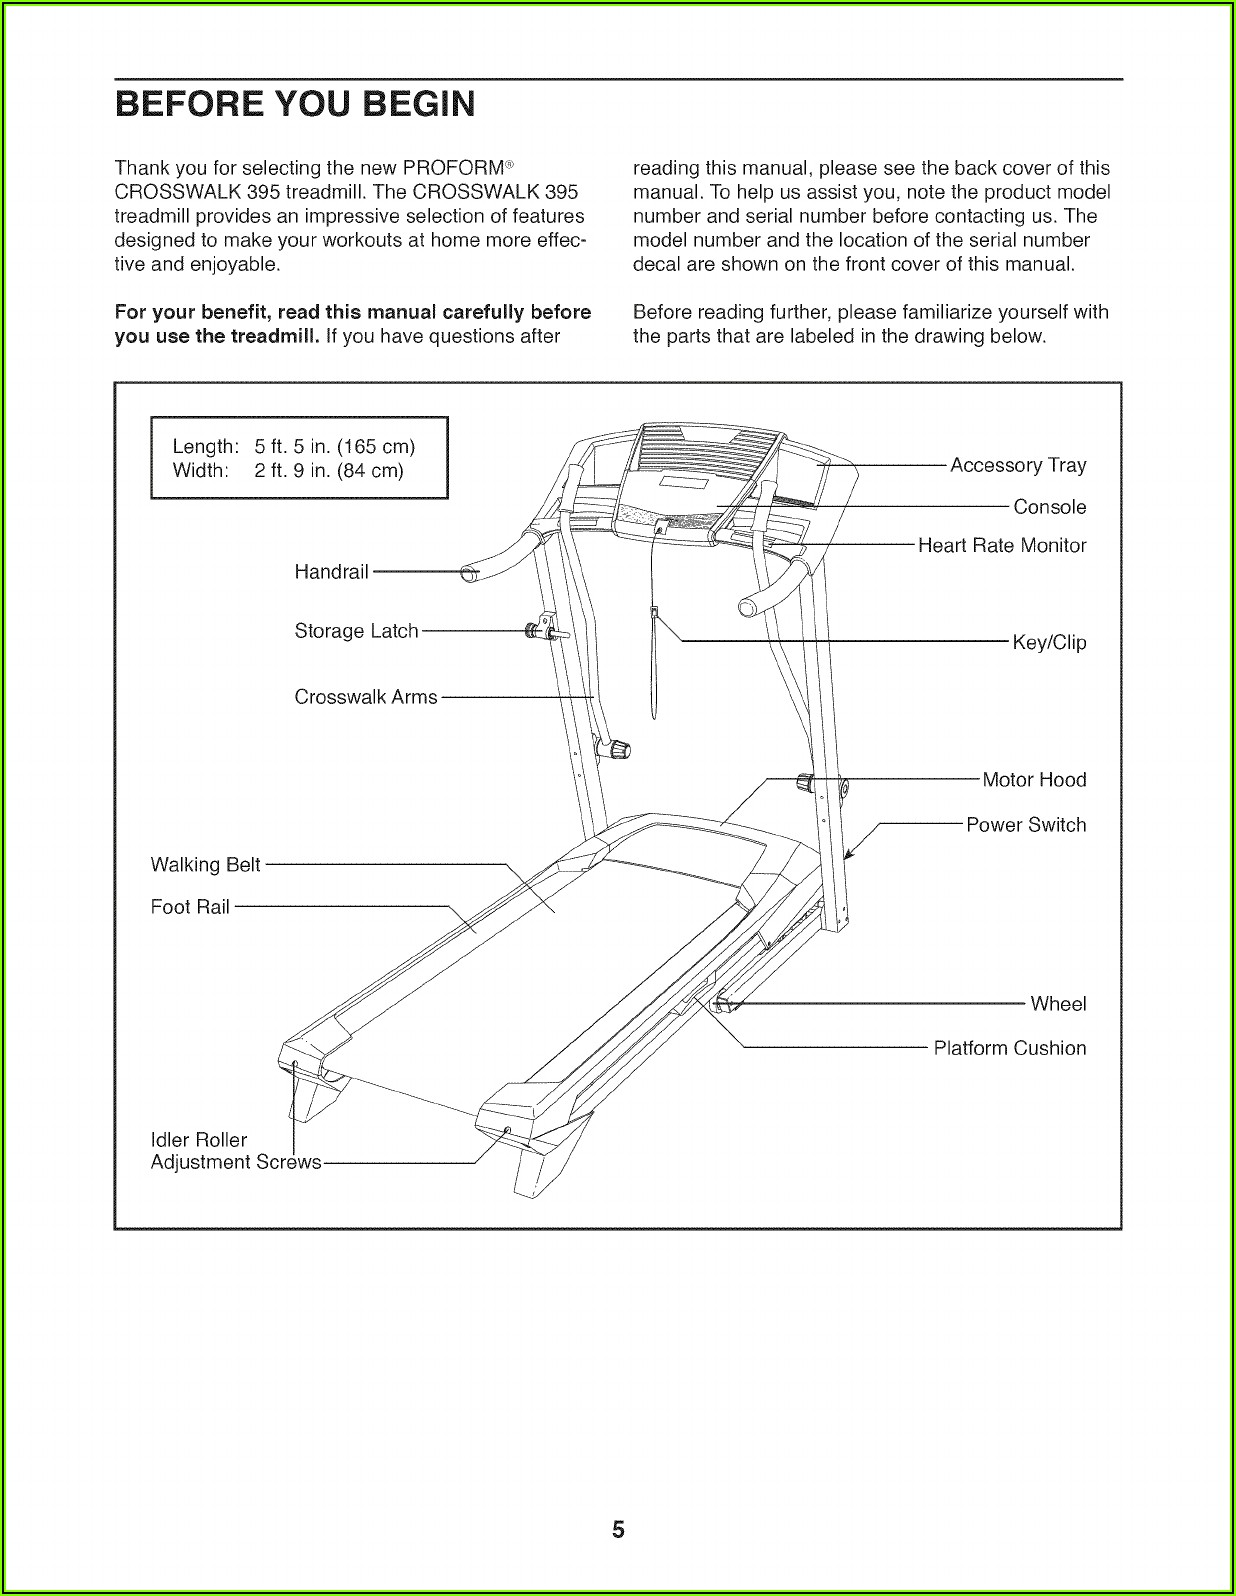 Proform Crosswalk 395 Manual